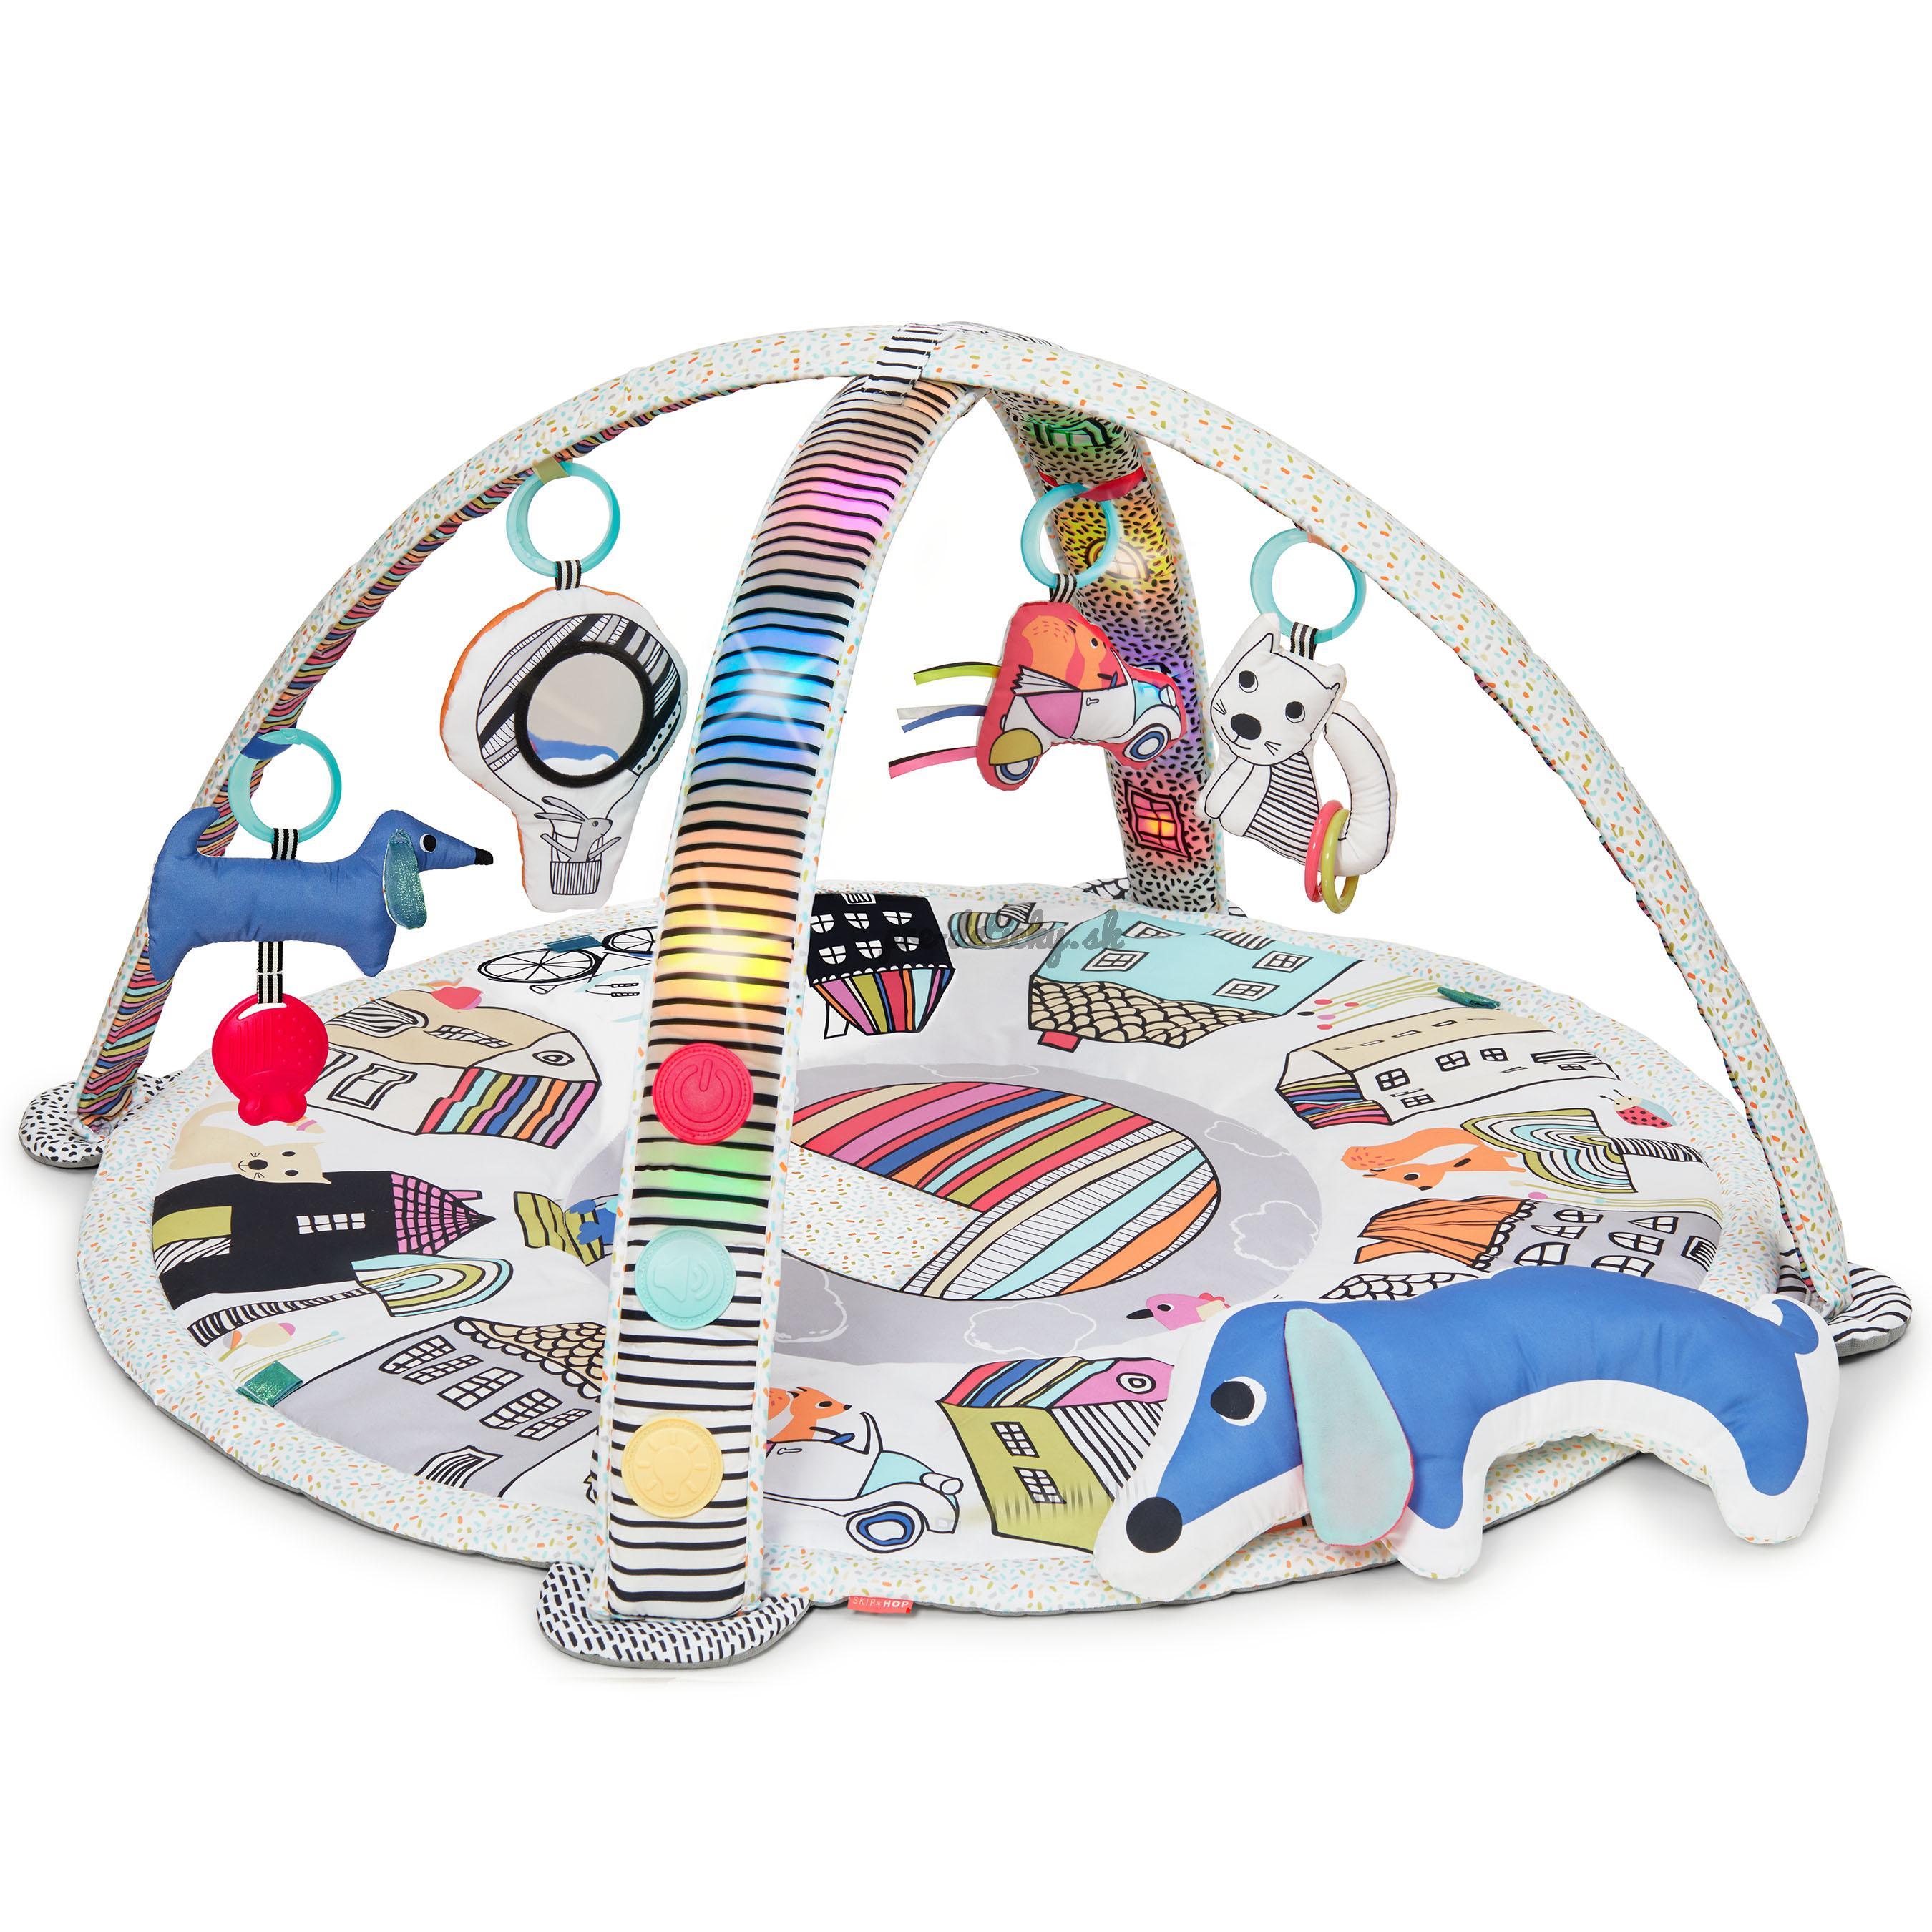 Skip Hop Deka na hranie hudobná, svietiaca, 4 hračky Vibrant Village 0m+